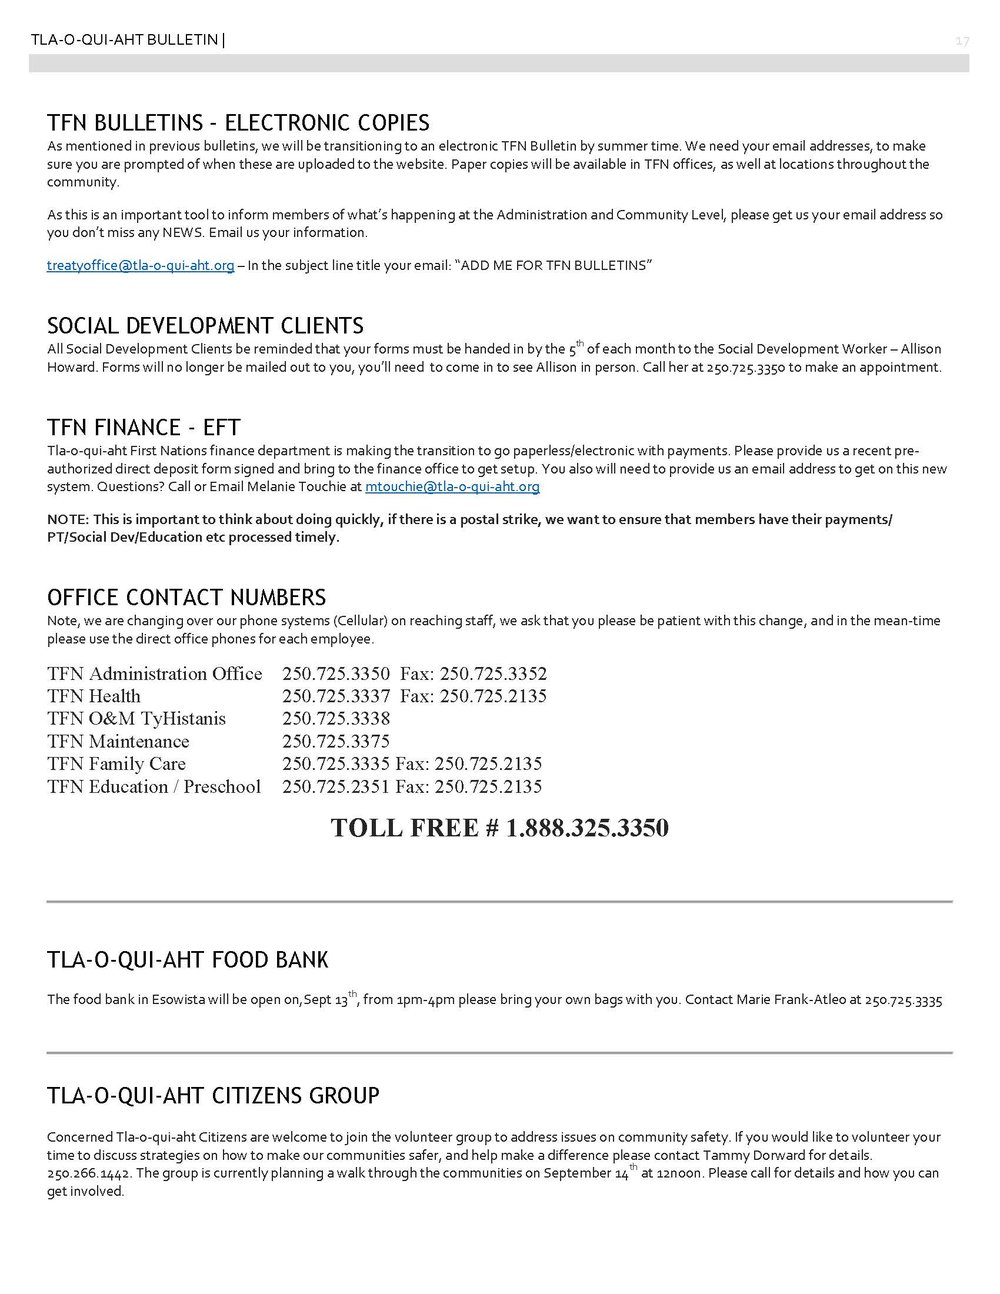 TFN Bulletin Sept 1-2016_Page_17.jpg